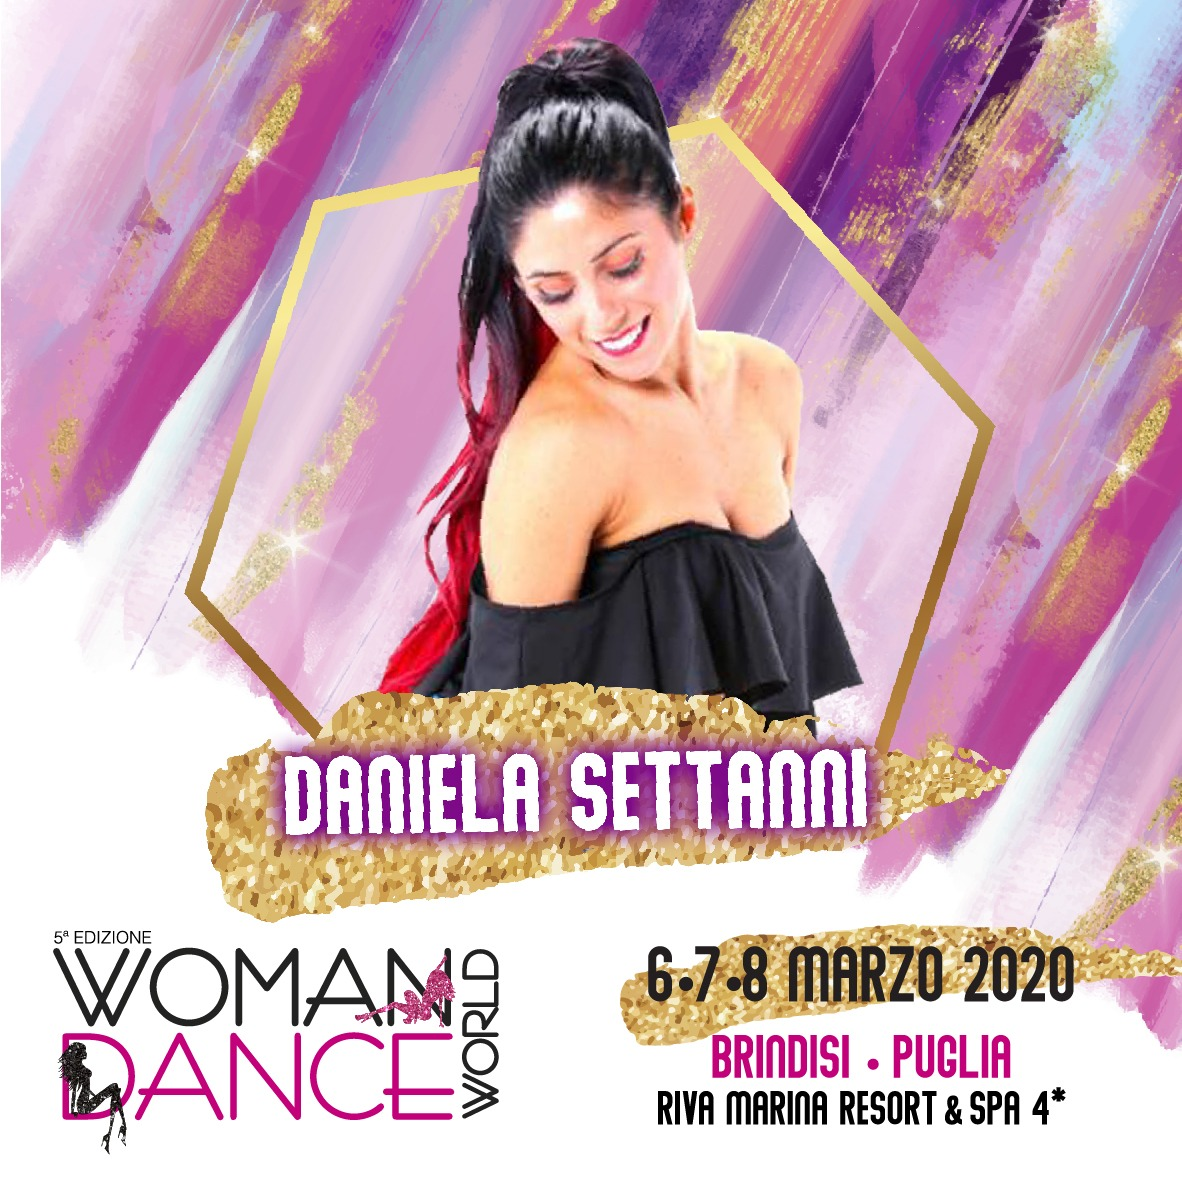 Daniela Settanni